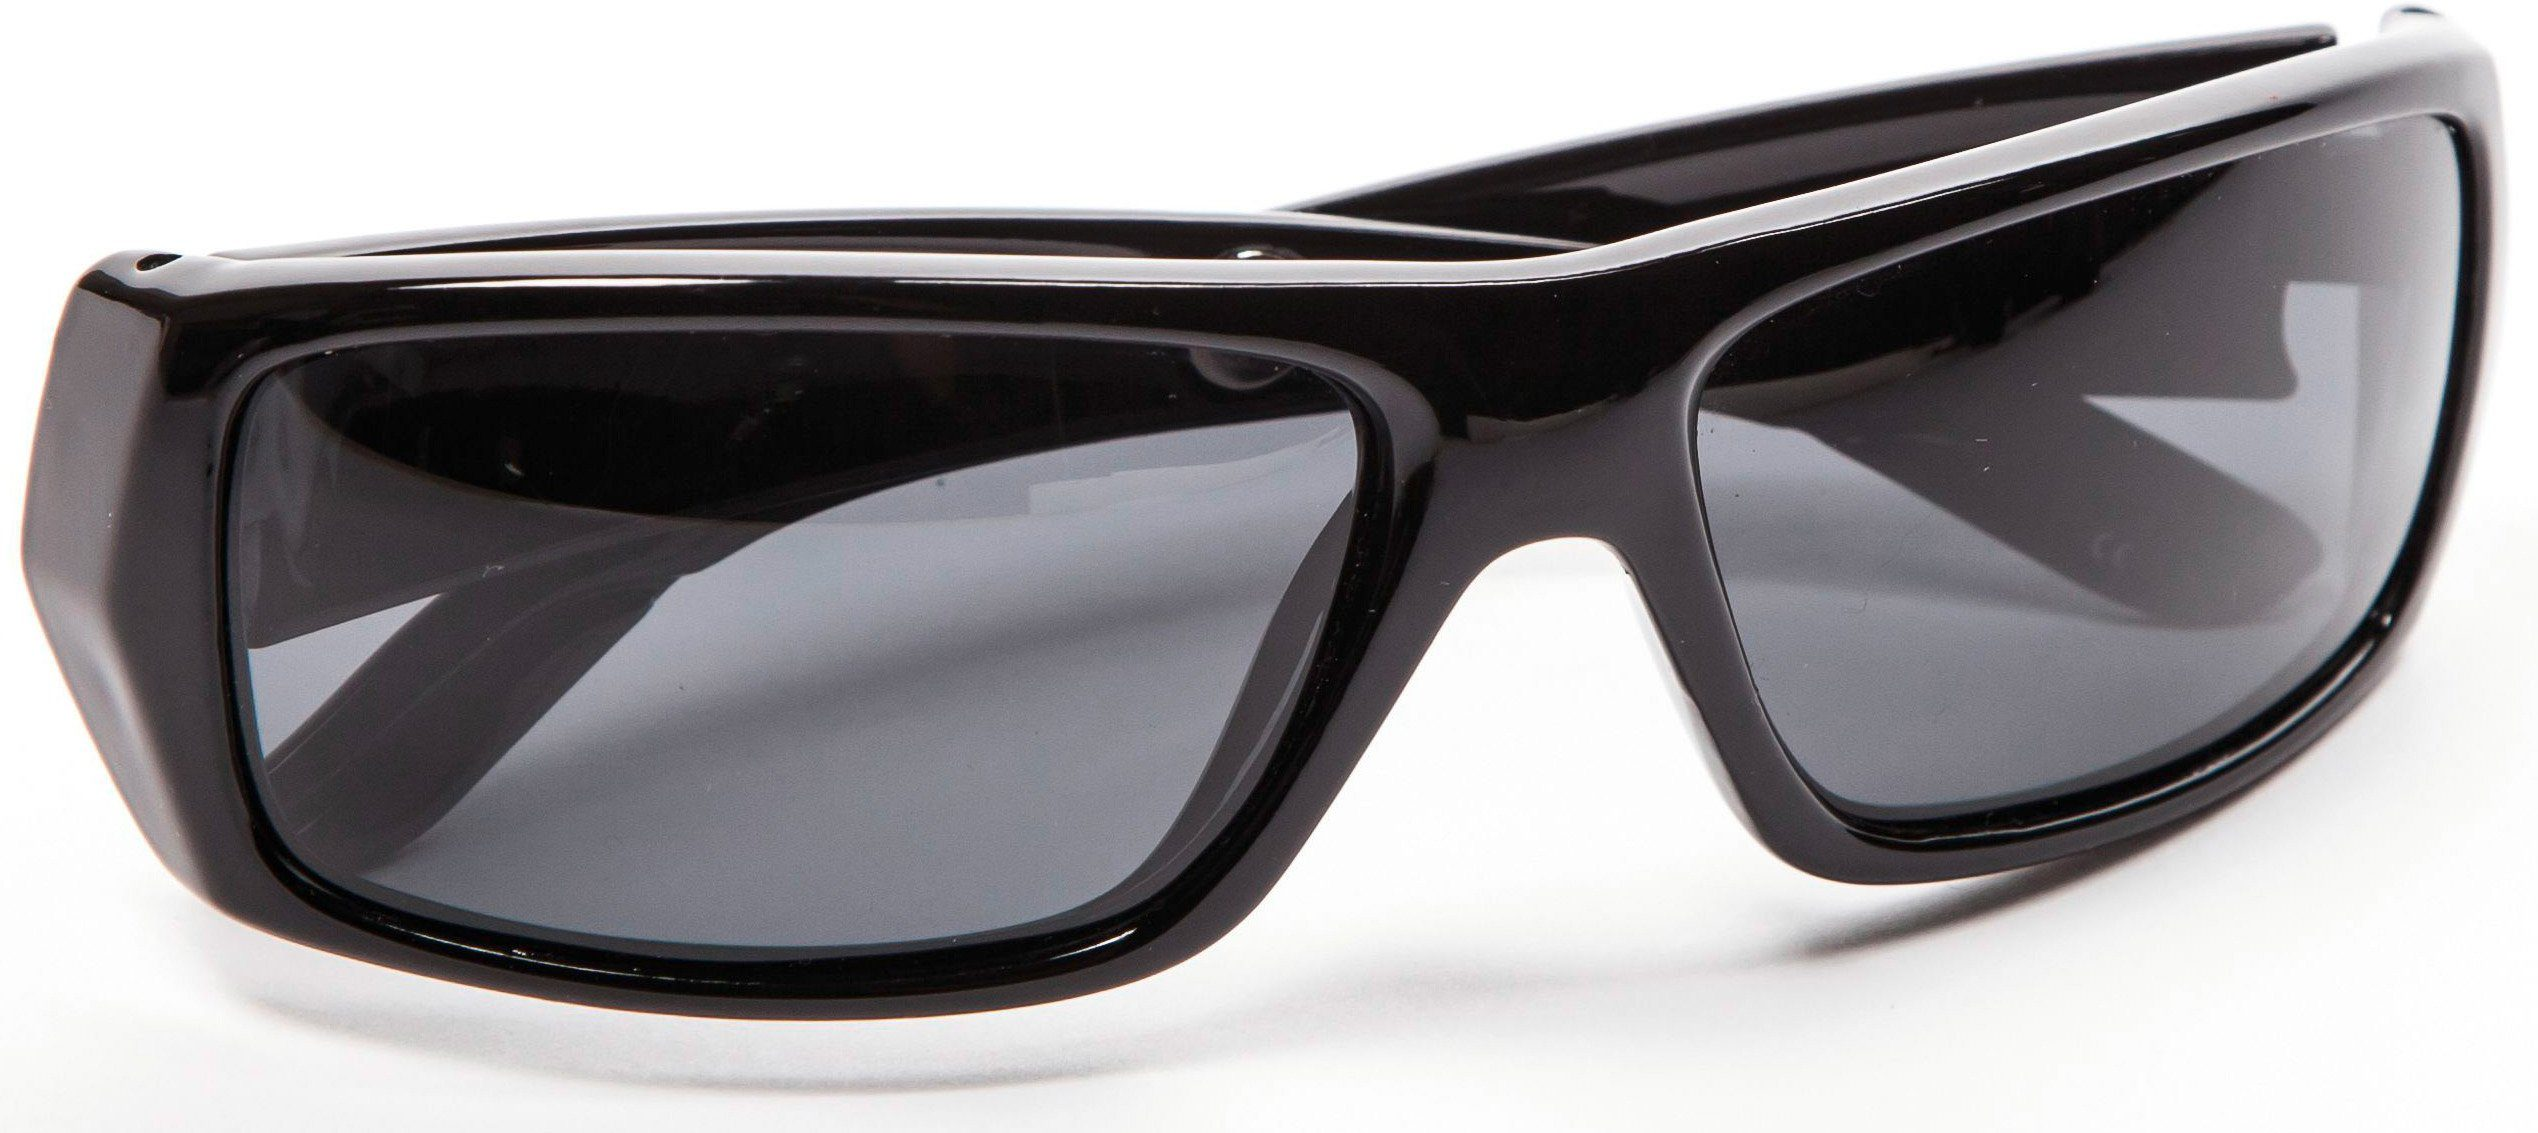 Polaryte Sonnenbrille, »Polaryte Einzelbrille«